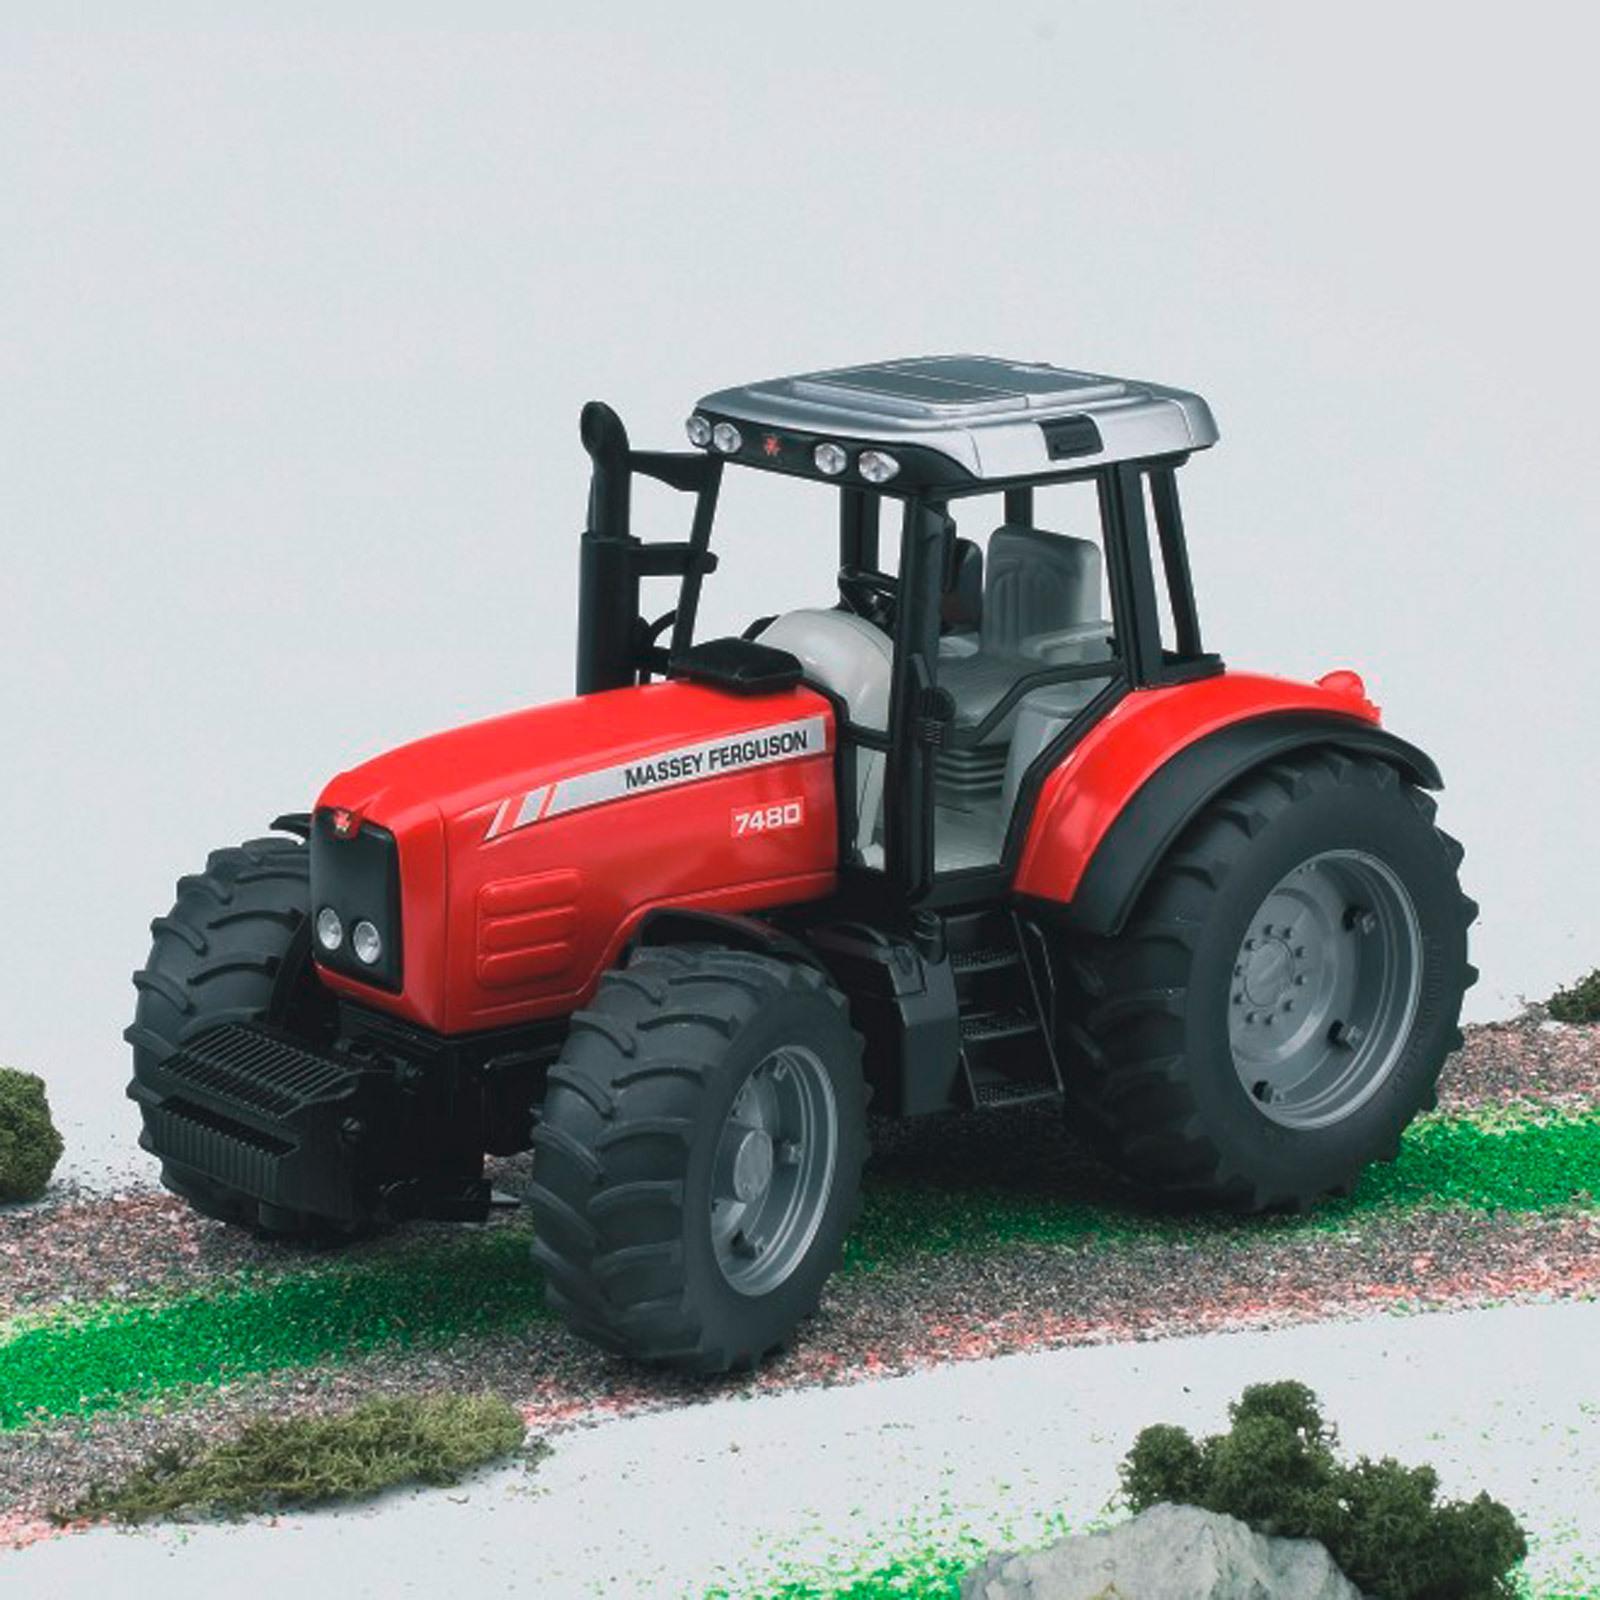 Bruder kinder spielzeug traktor schlepper massey ferguson